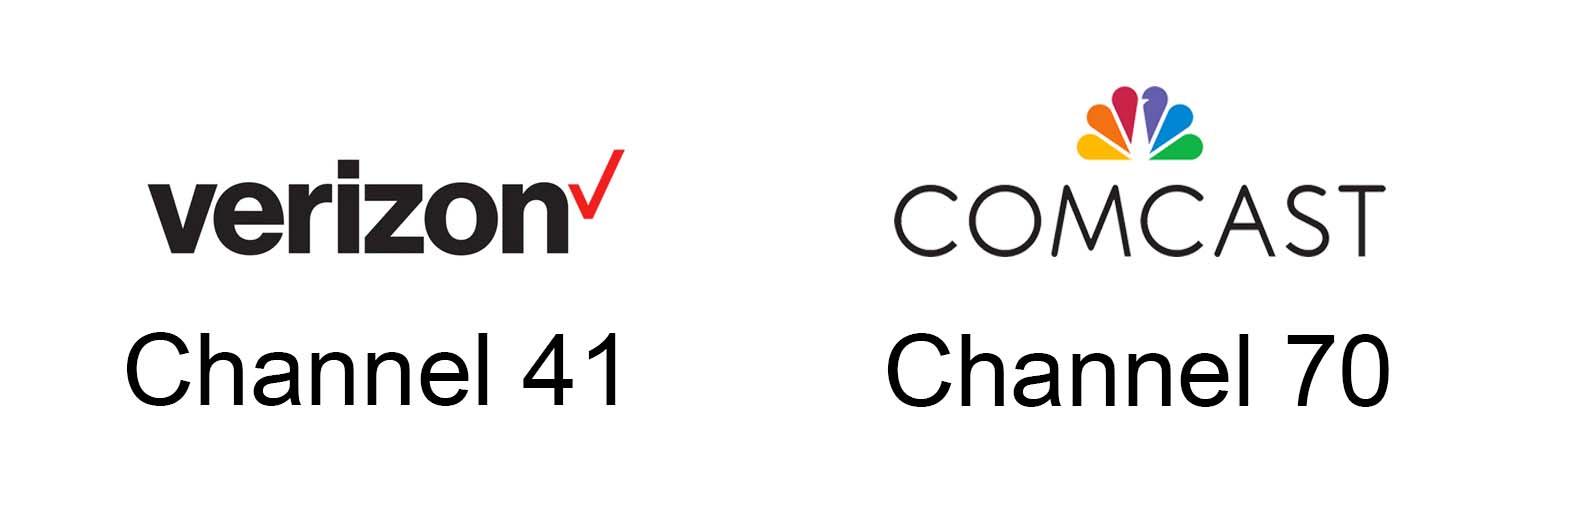 AETV Ch Banner 2 copy